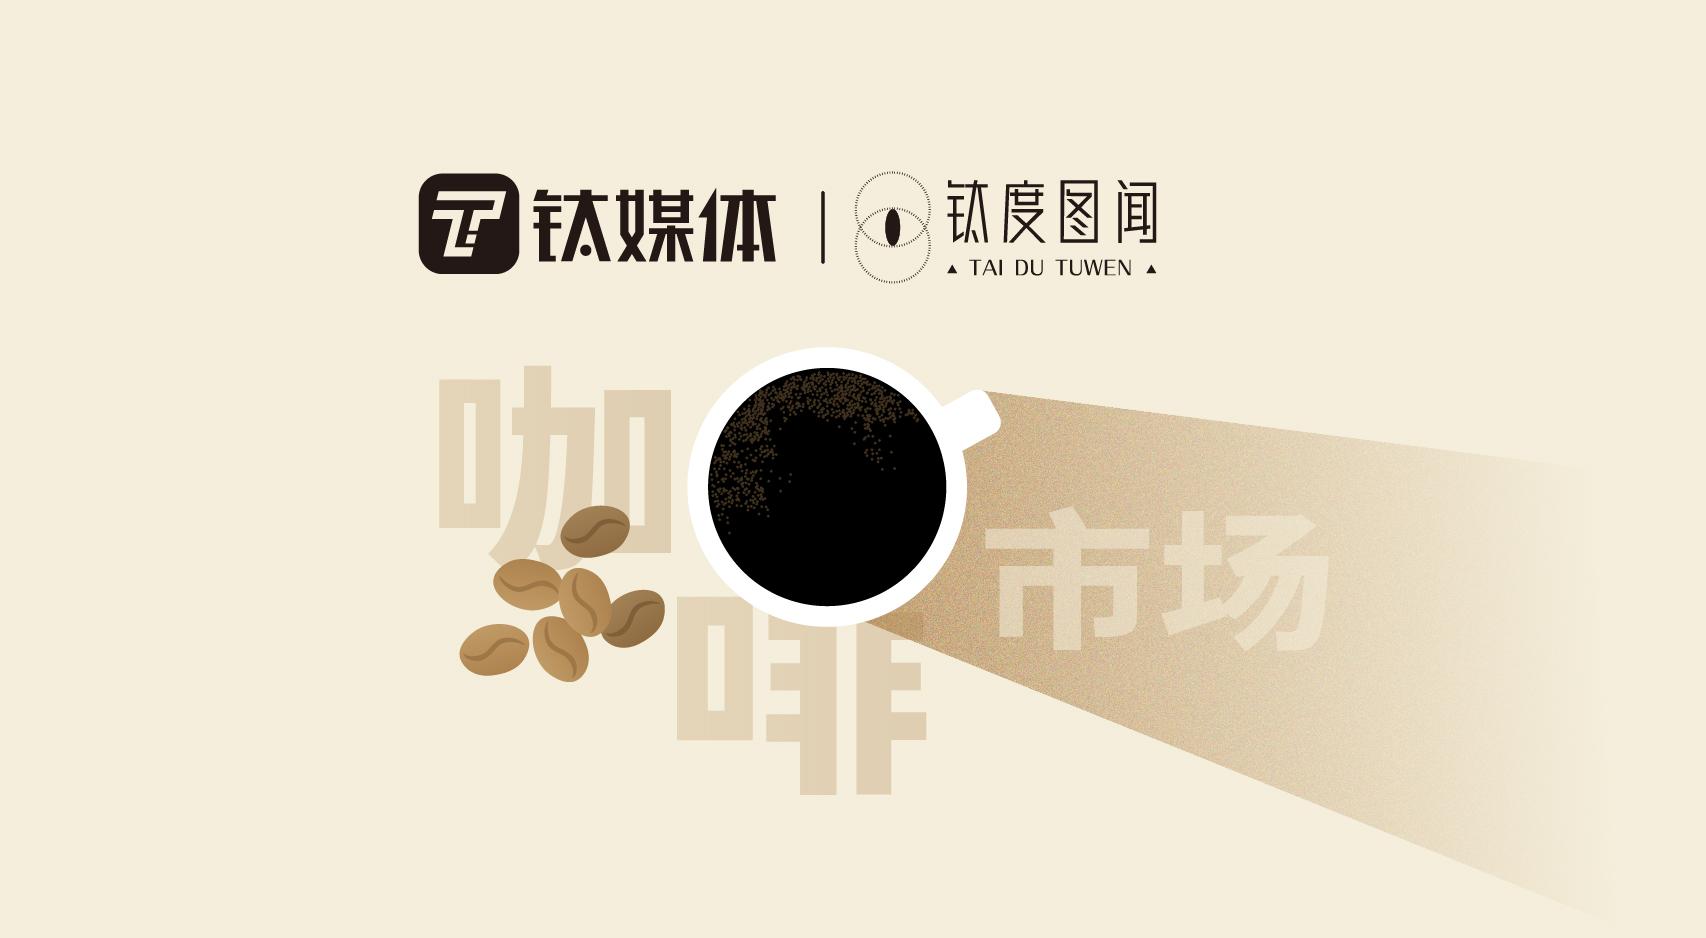 <em>资本</em>进场,品牌涌现,一图读懂中国咖啡市场进化史 | 钛度图闻